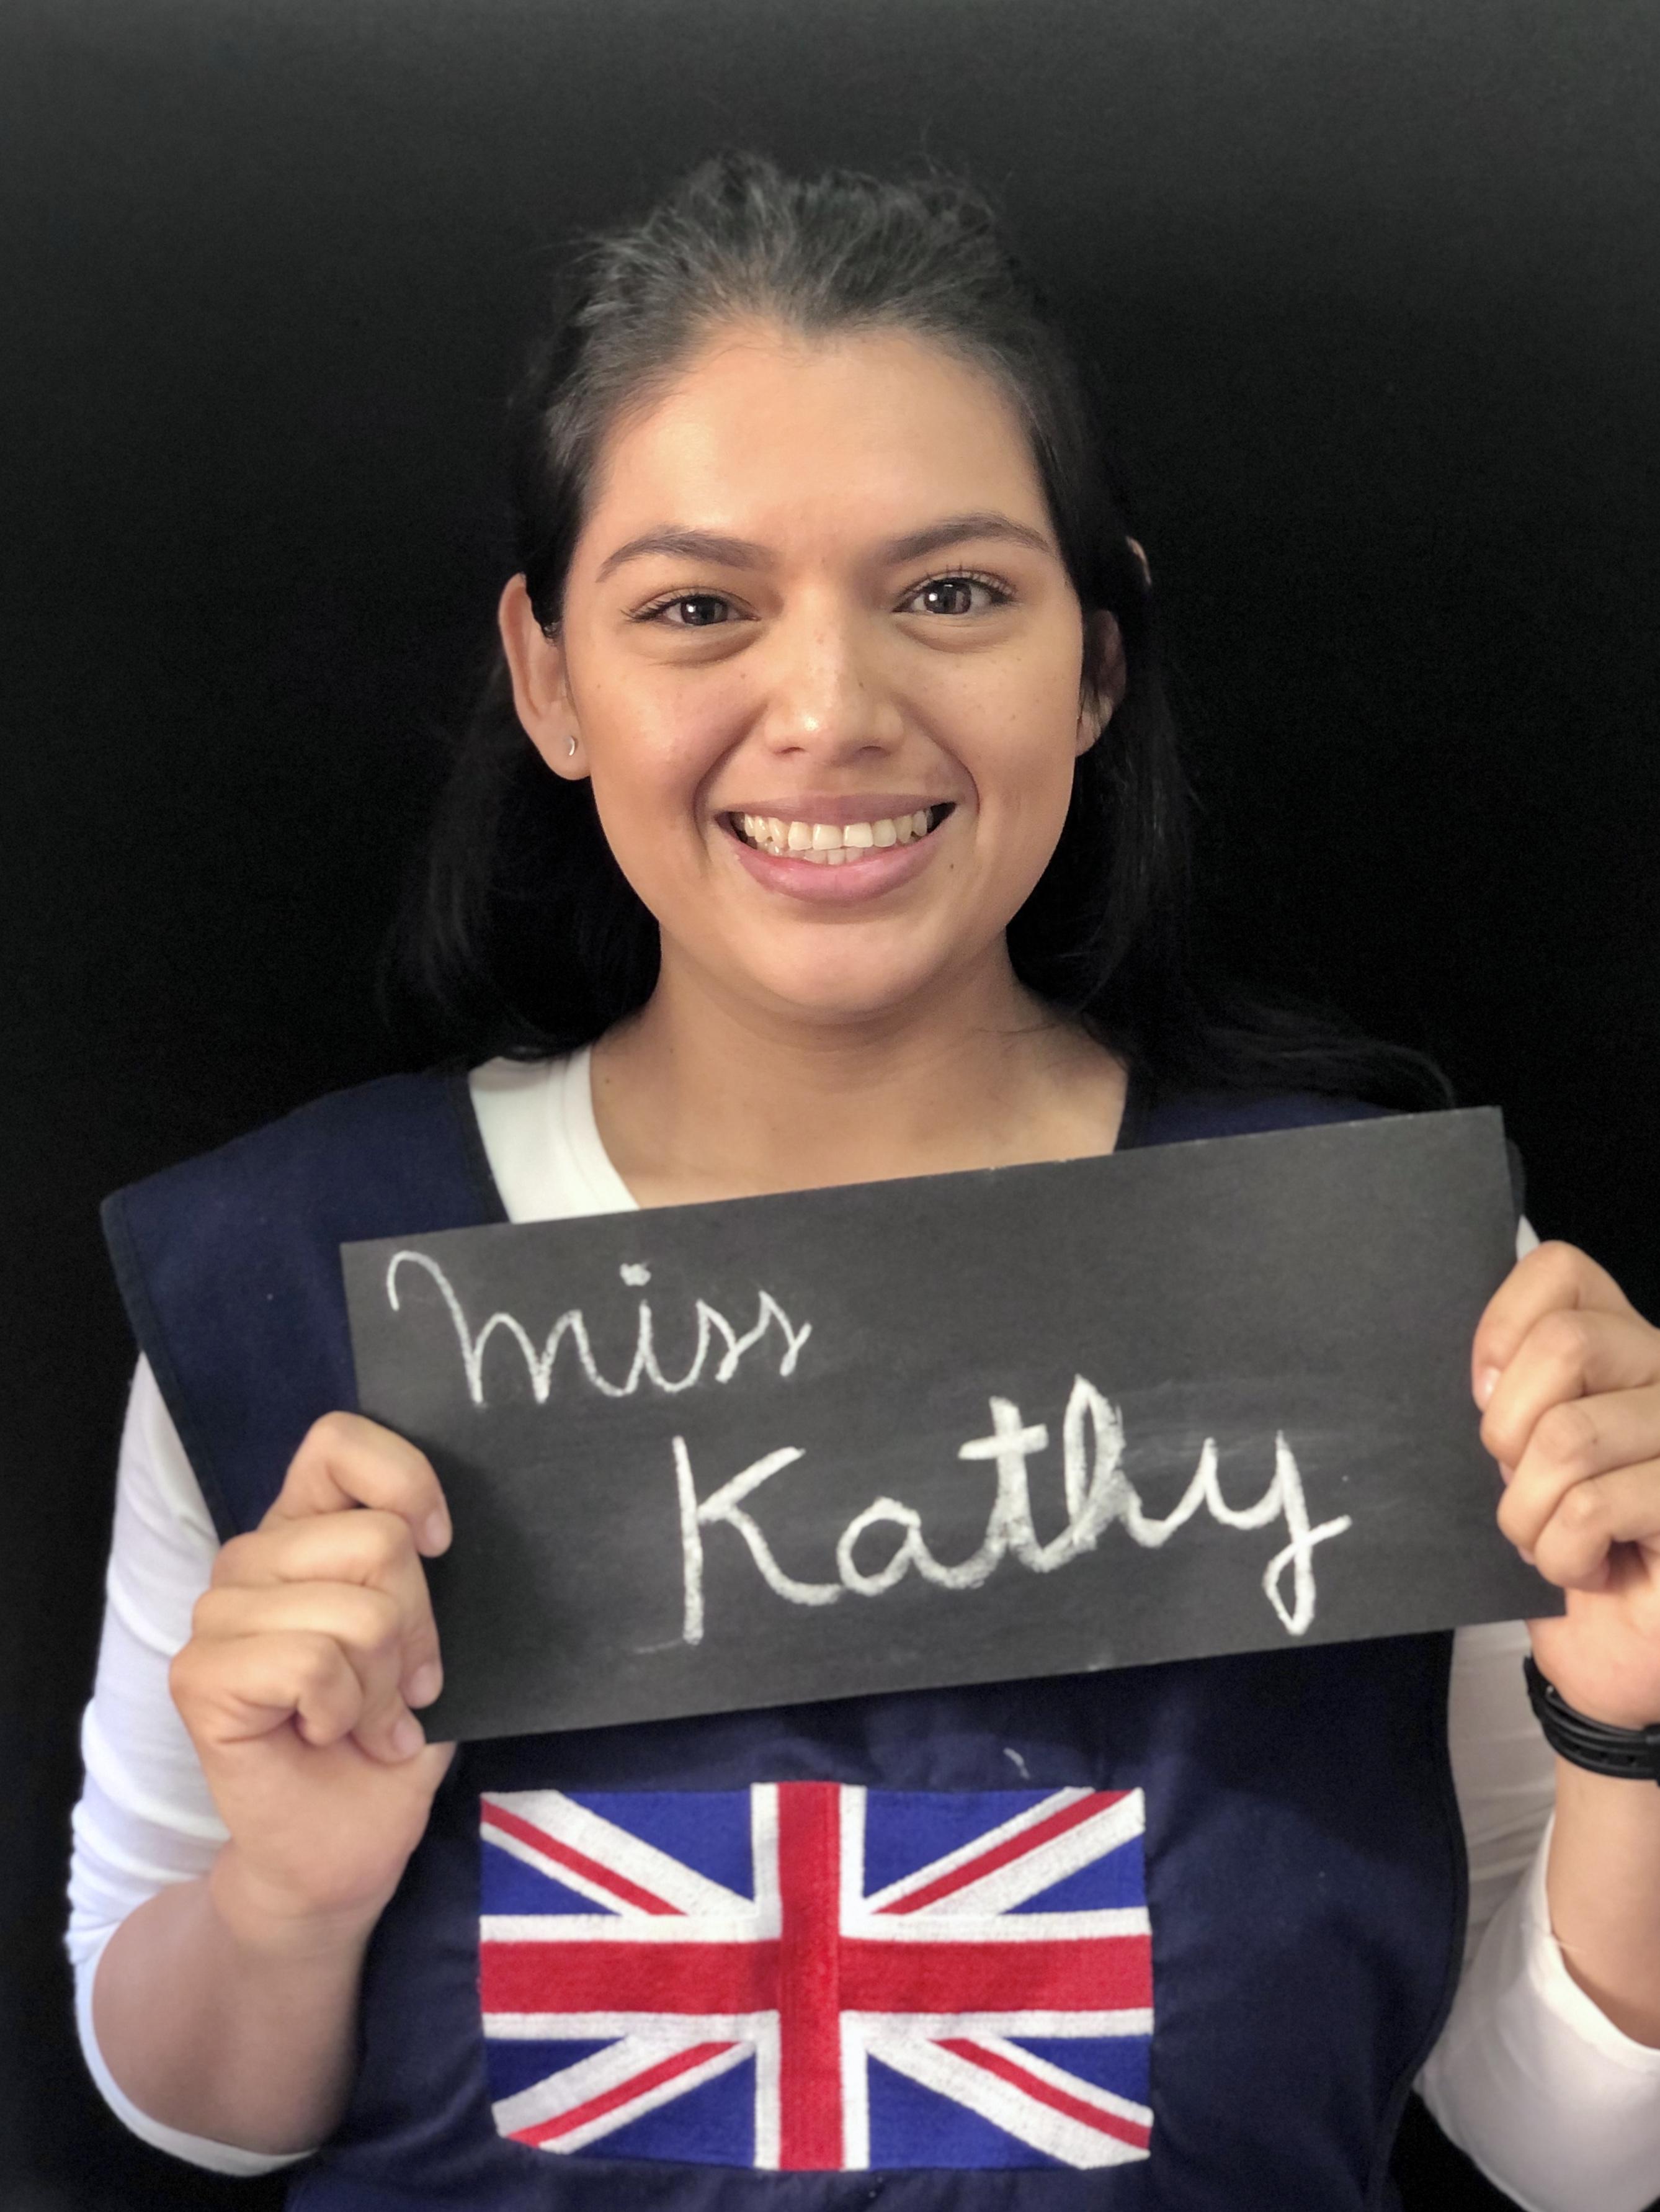 Miss Kathy